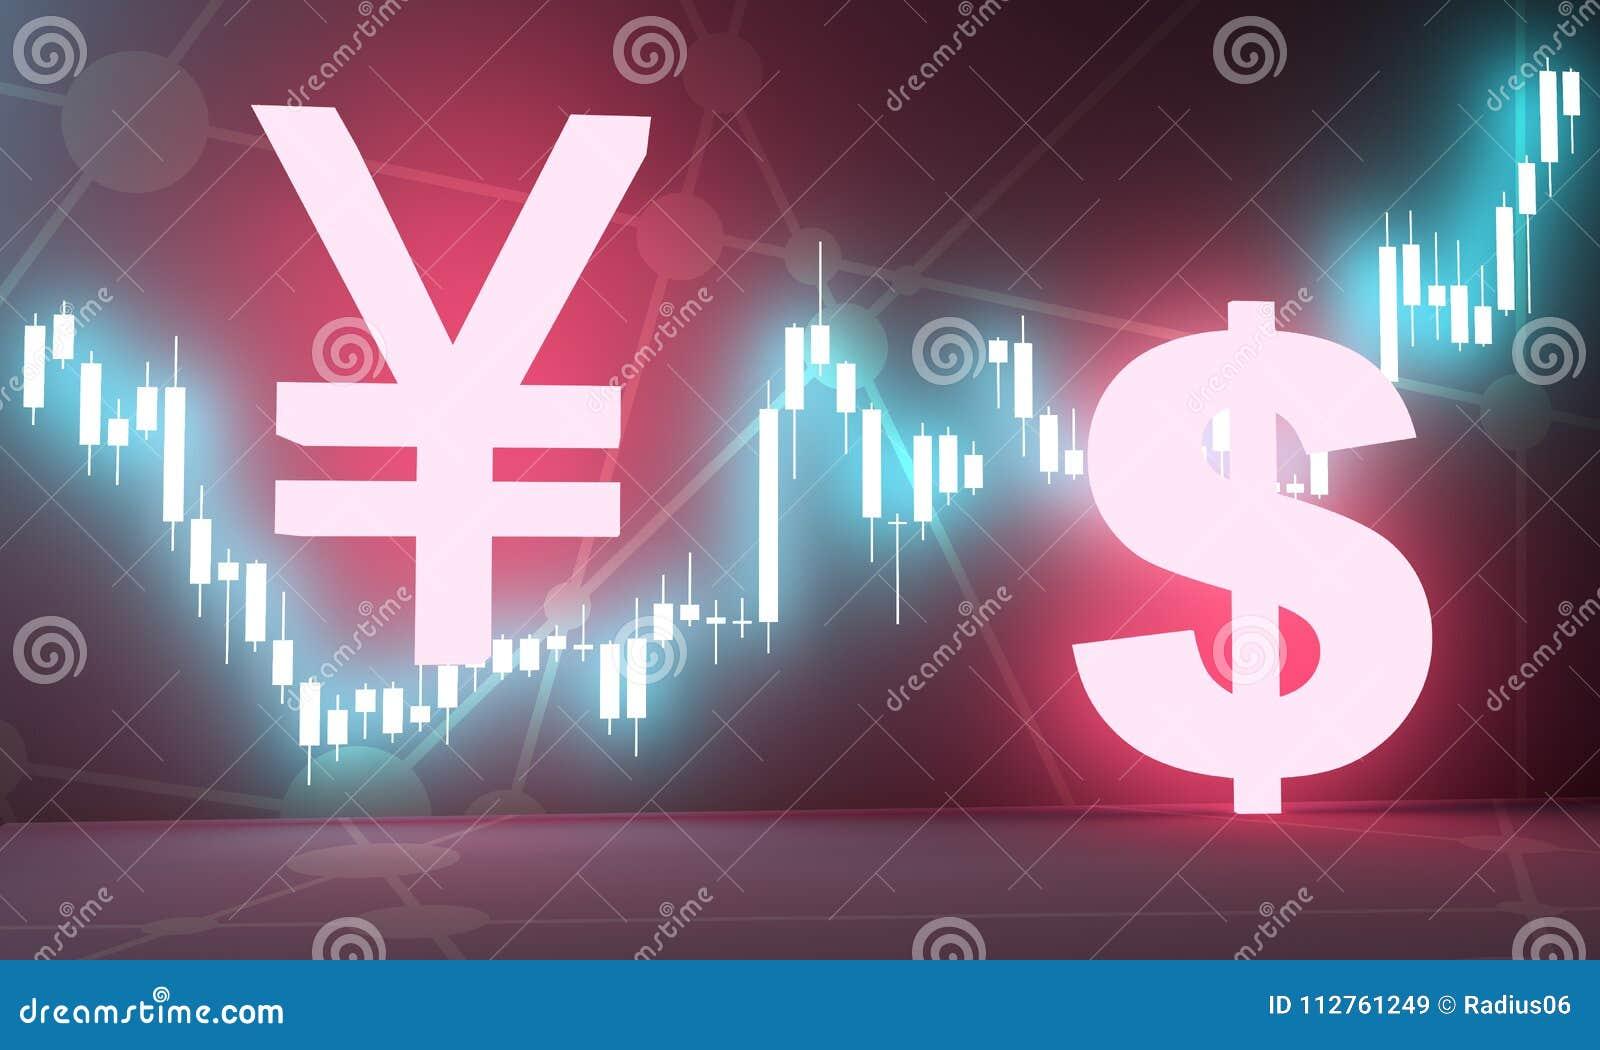 Candlestick Stock Exchange Background Stock Illustration